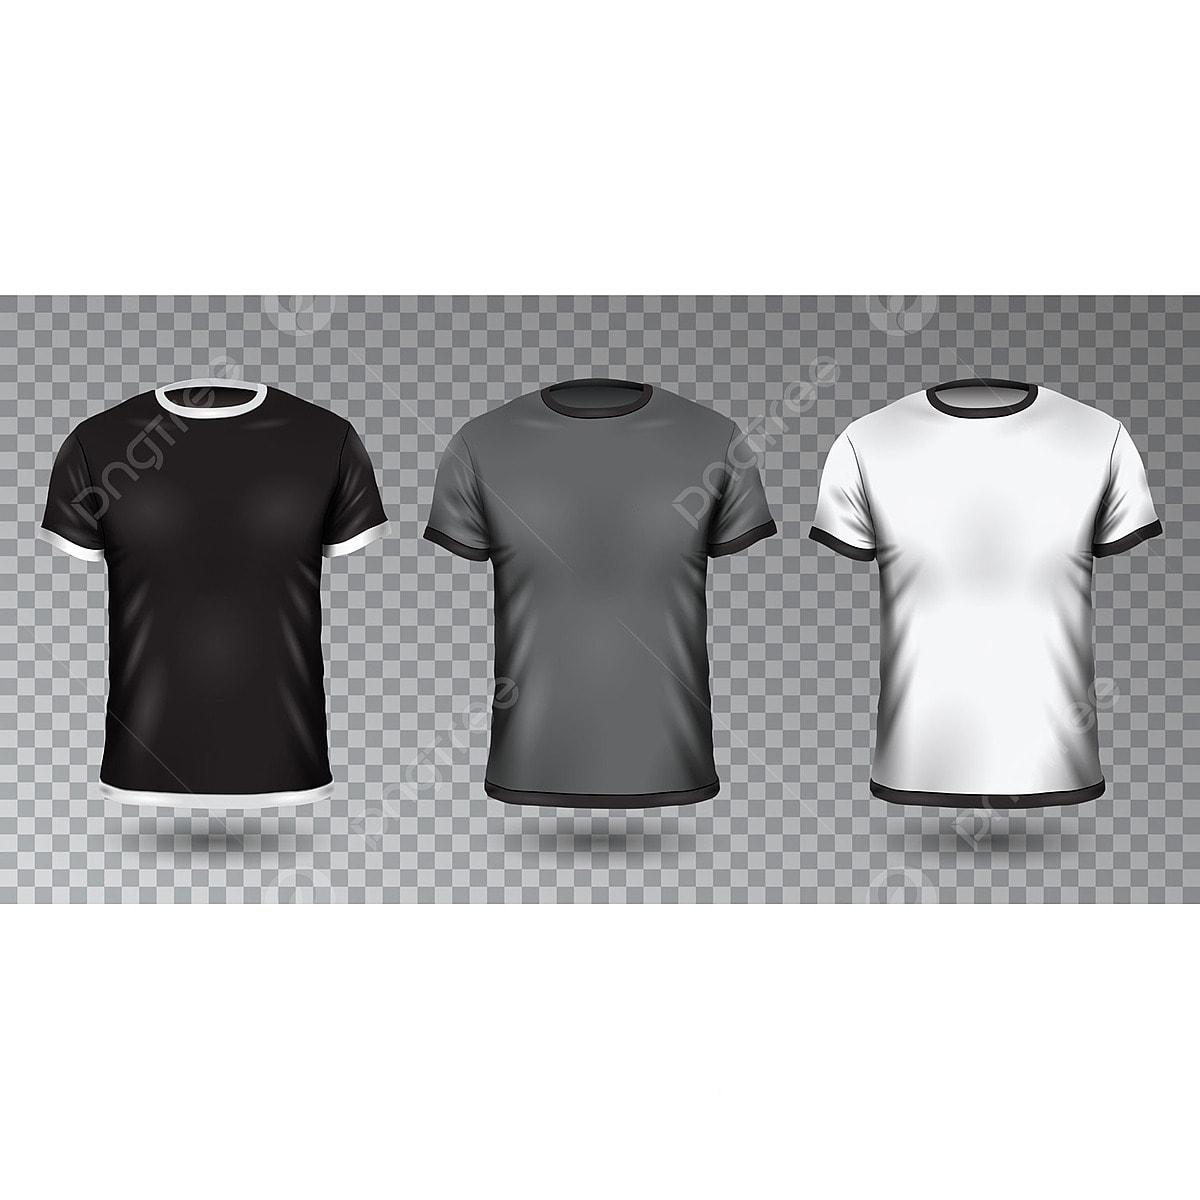 Realistic Unisex Shirt Design Tempale On Transparent Background